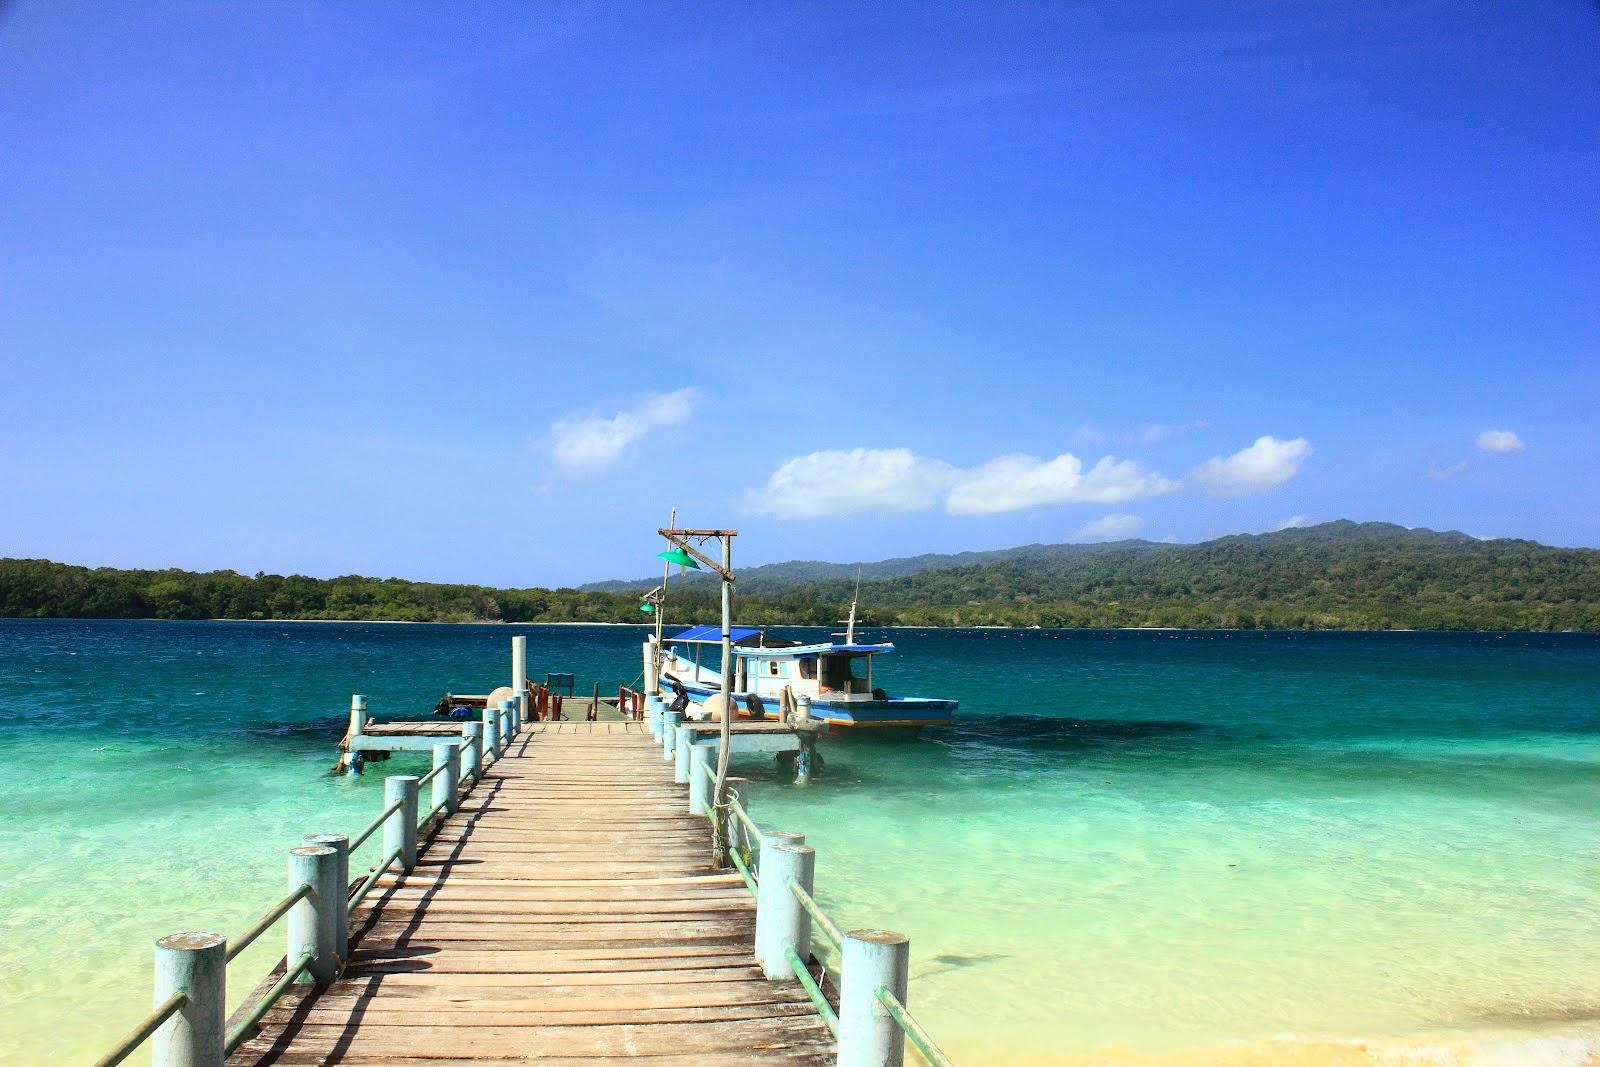 Cantiknya Pantai di Pulau Peucang Ujung Kulon - Tempat Wisata